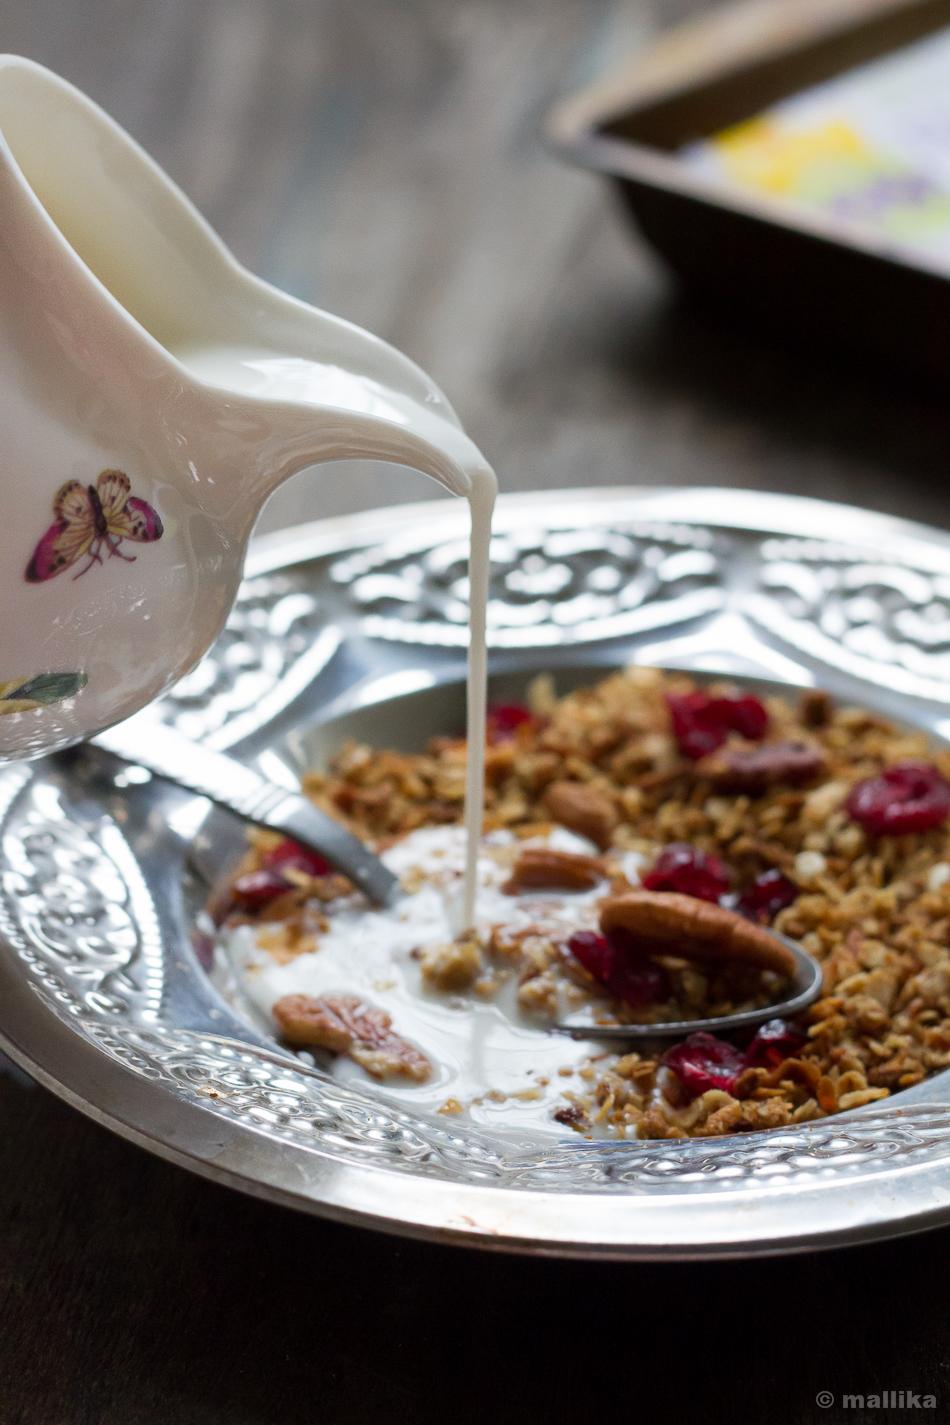 Pecan, Cranberry, Coconut Granola Served